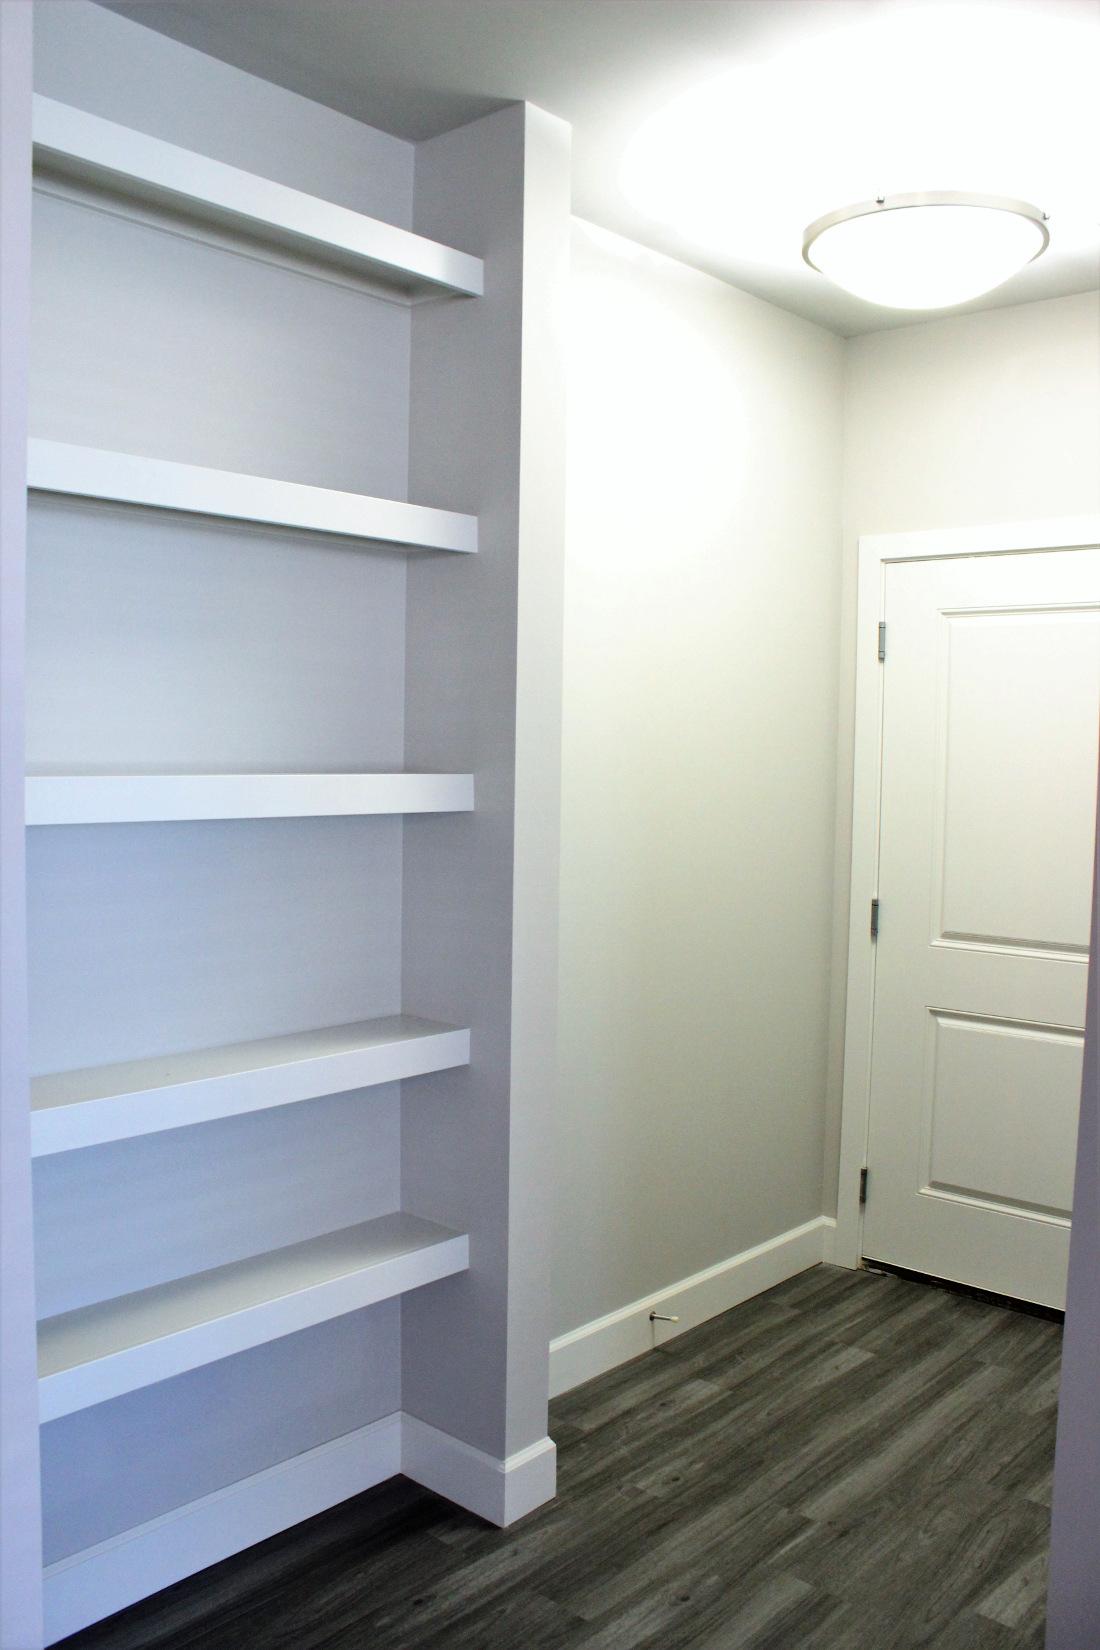 B1 Closet at the Vue at Creve Coeur Apartments in Creve Coeur, MO